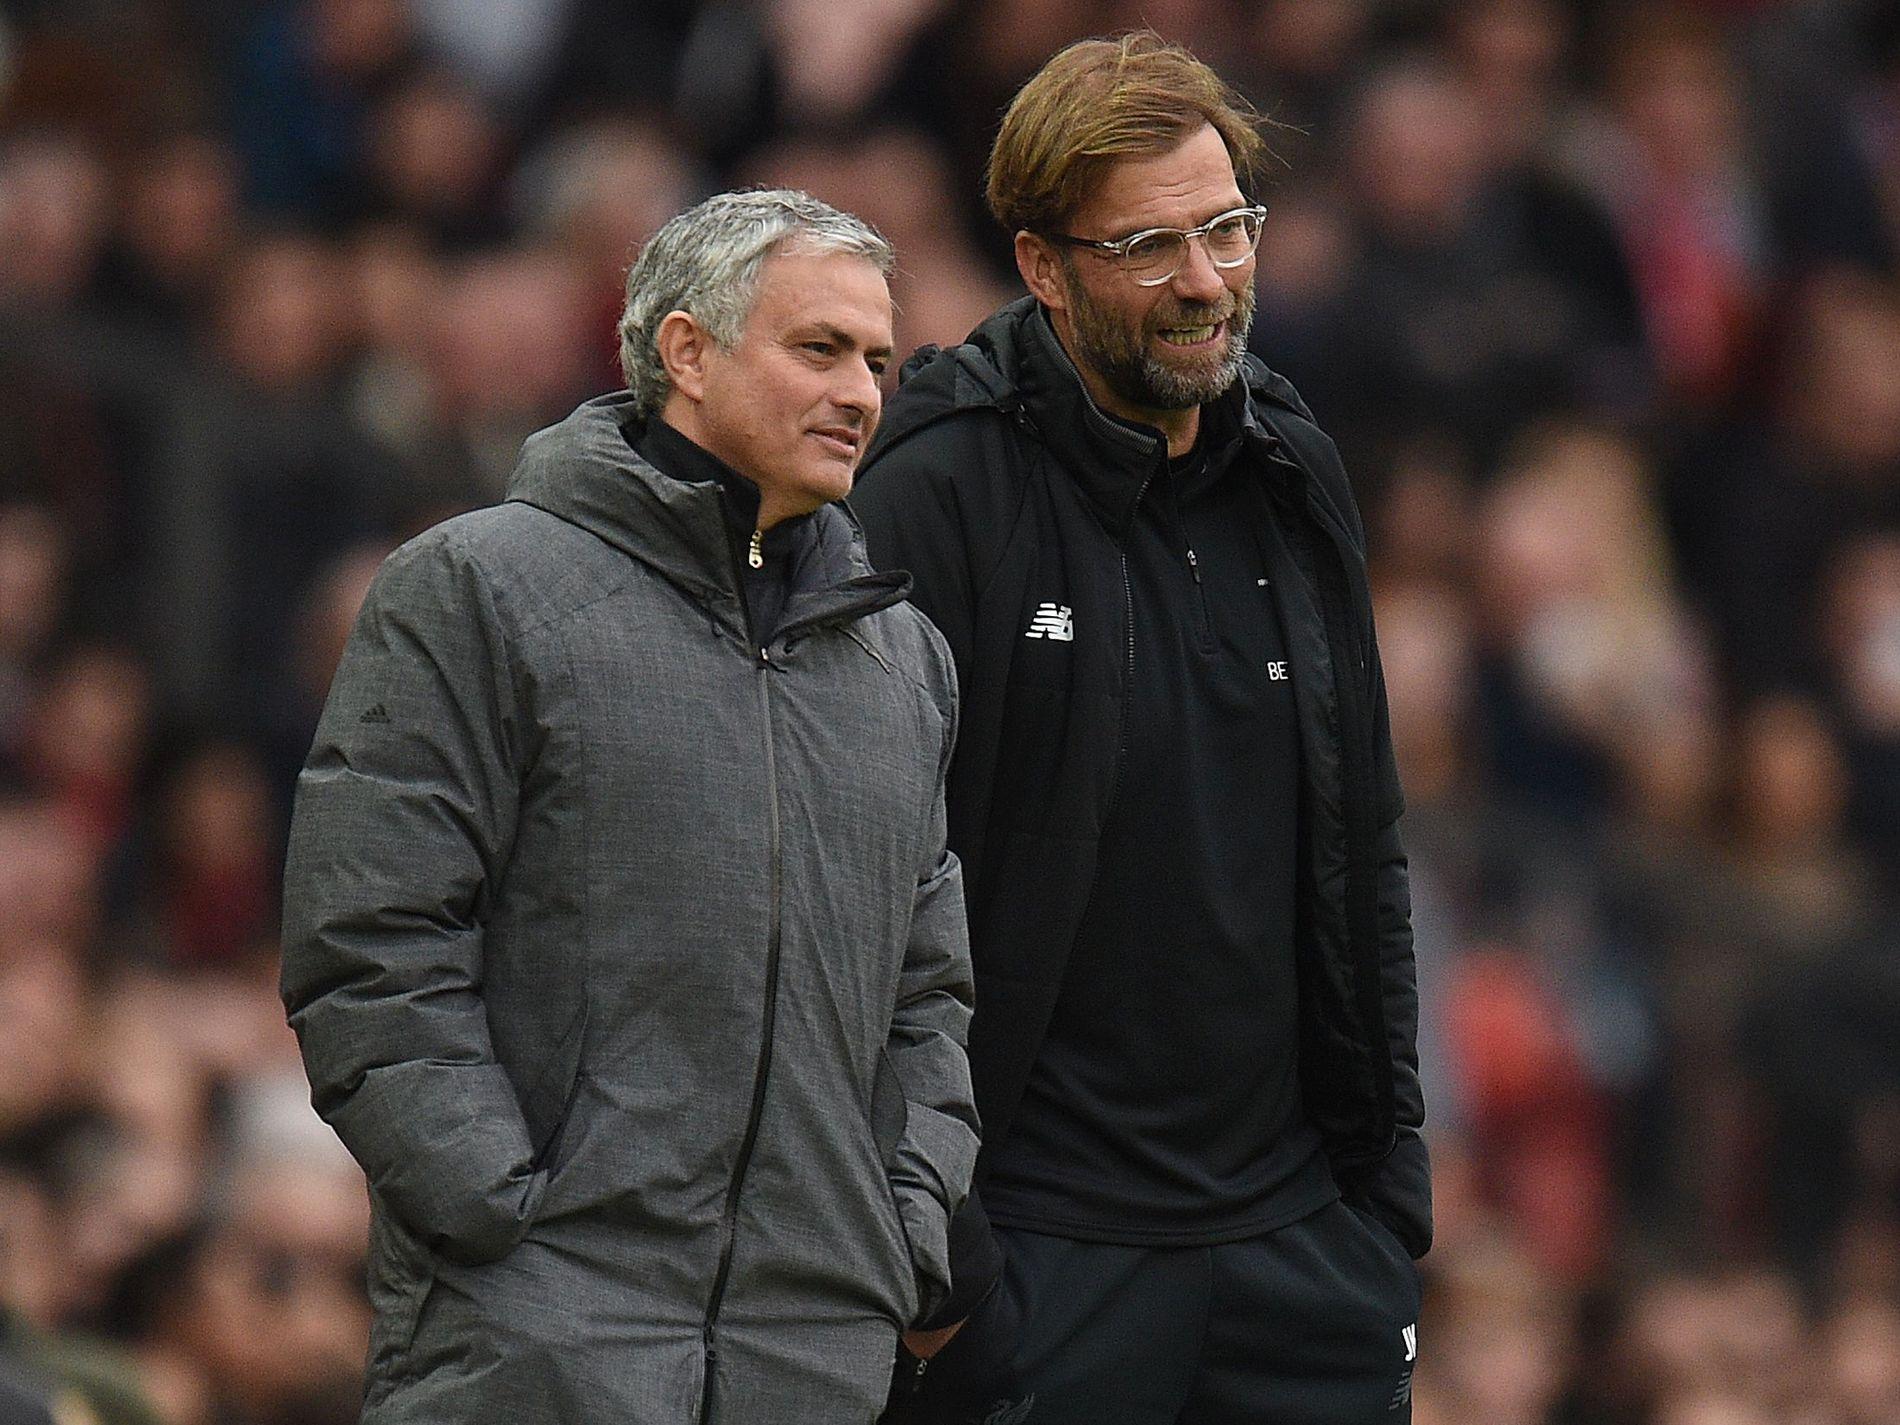 db5cf3652 Ny studie: Manchester United var heldigere enn Liverpool